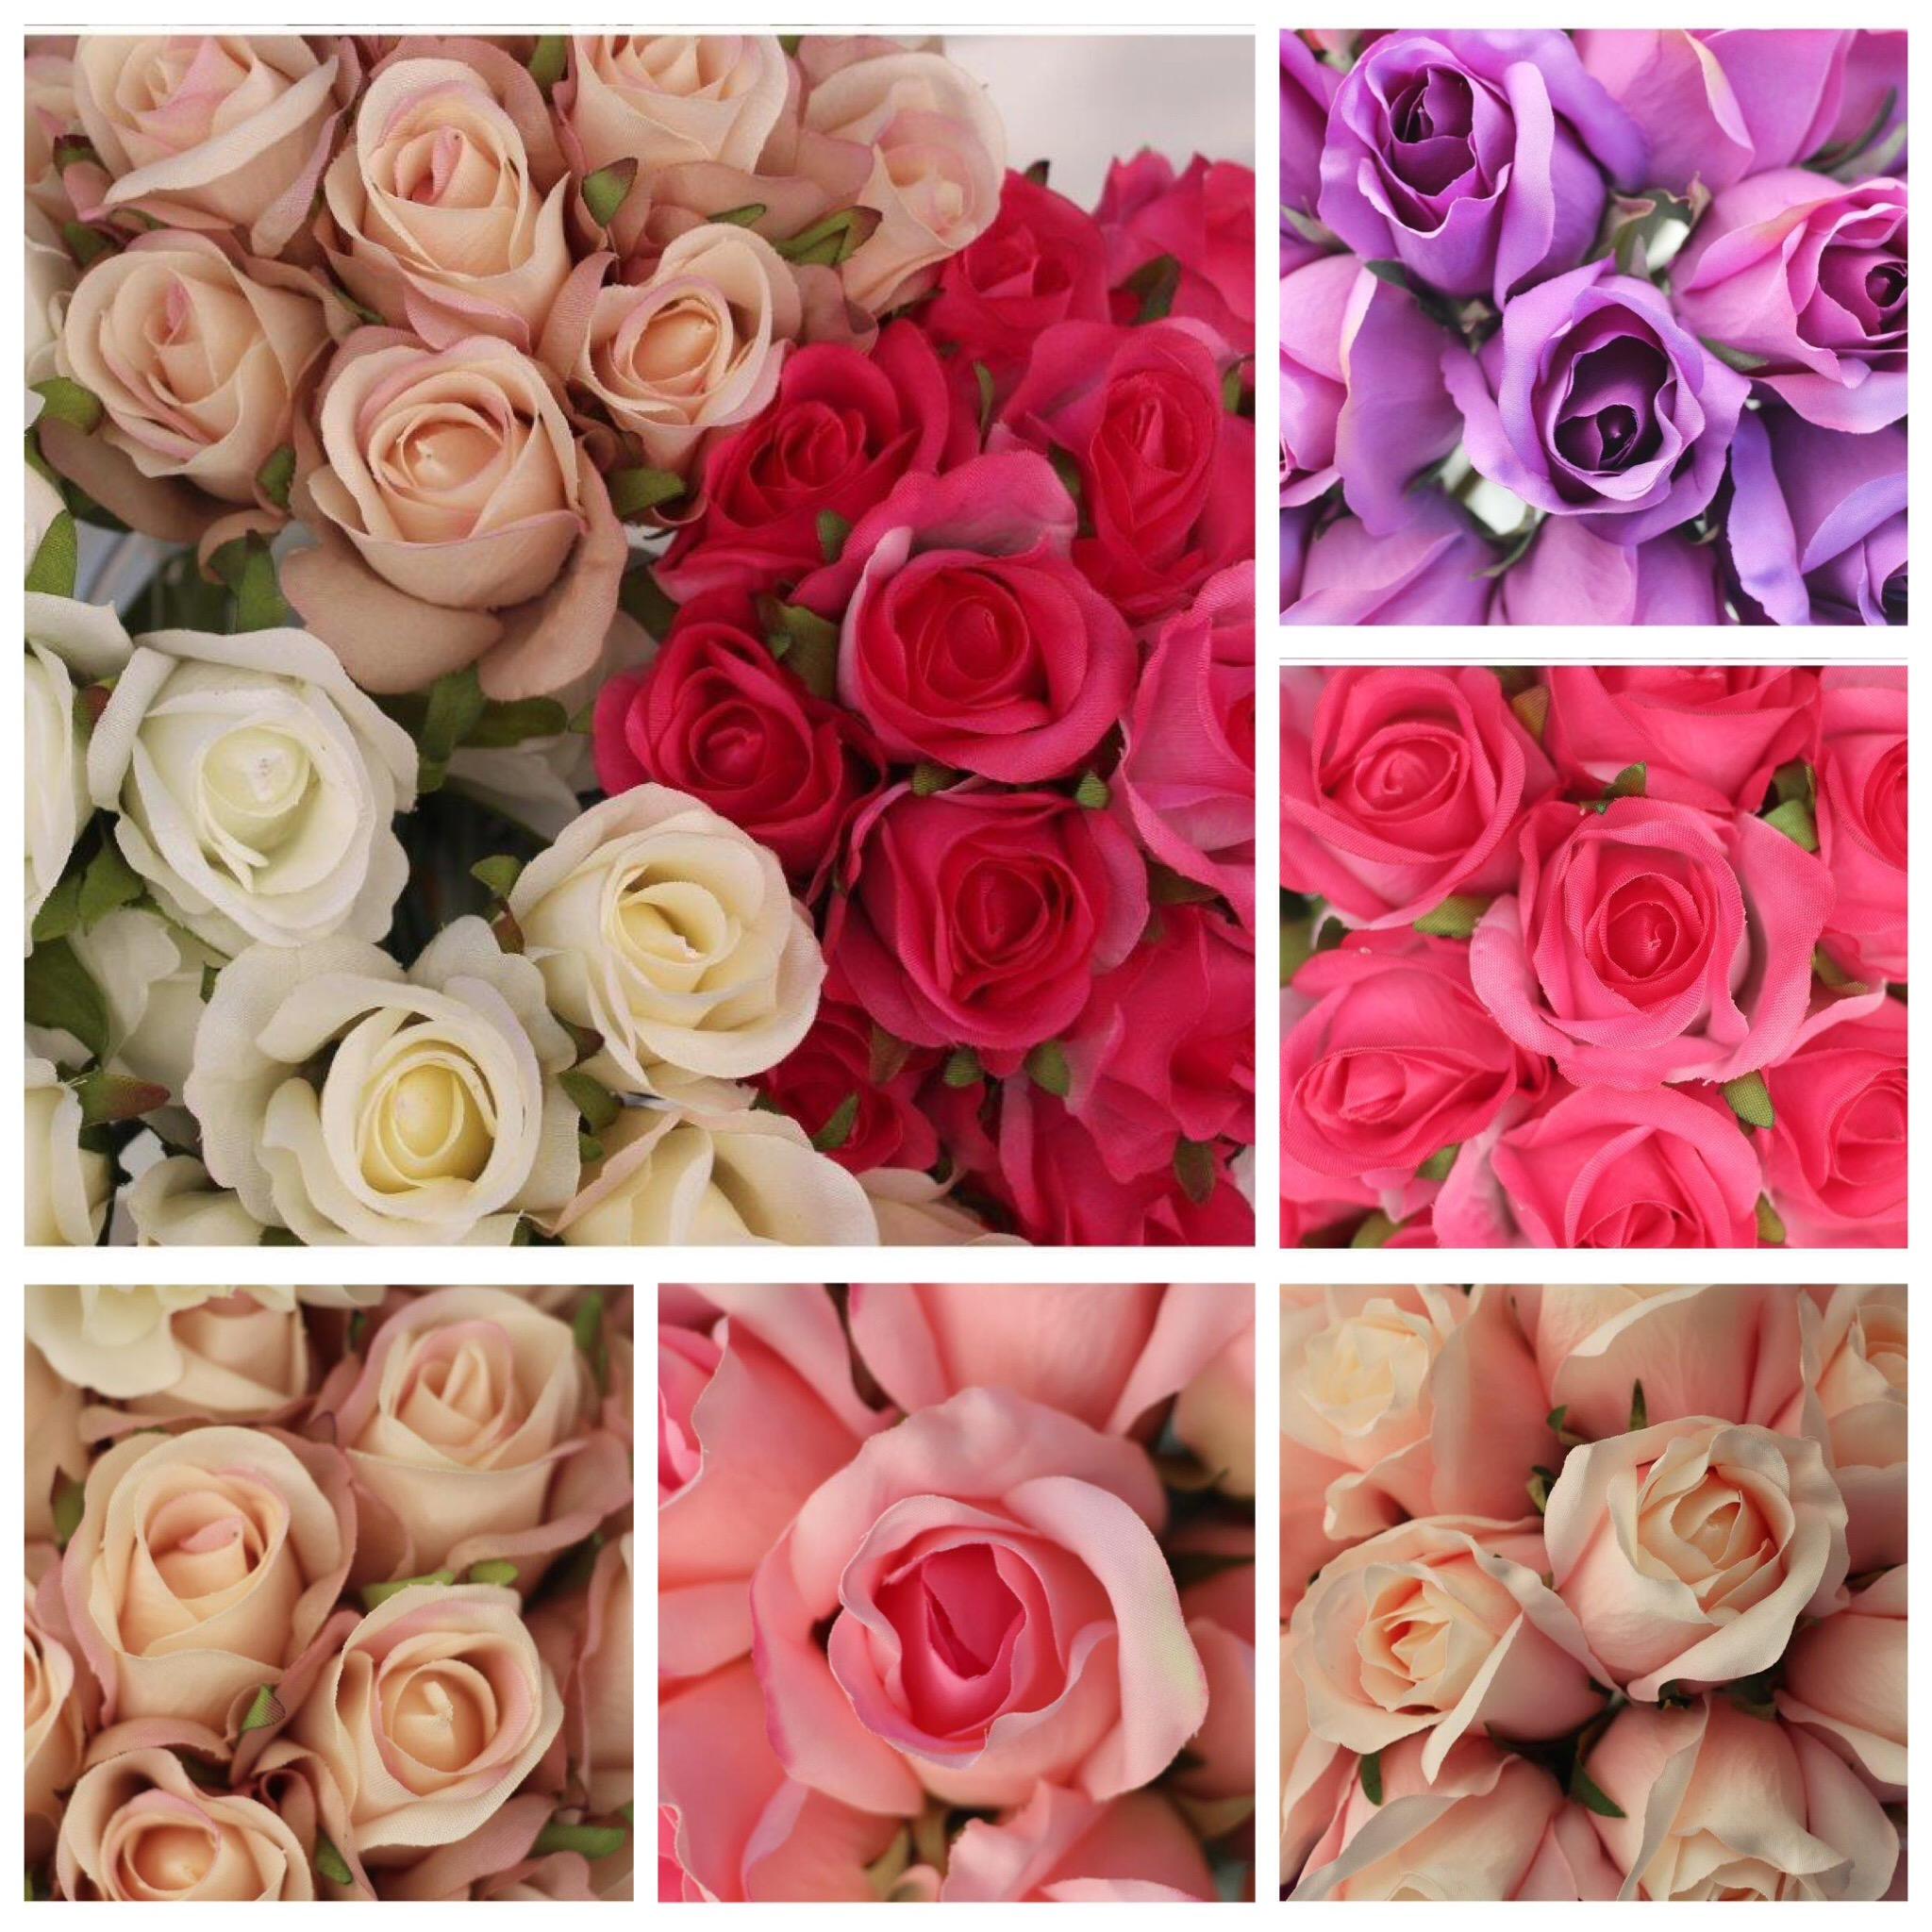 Stunning Roses Flowers Forever Perth